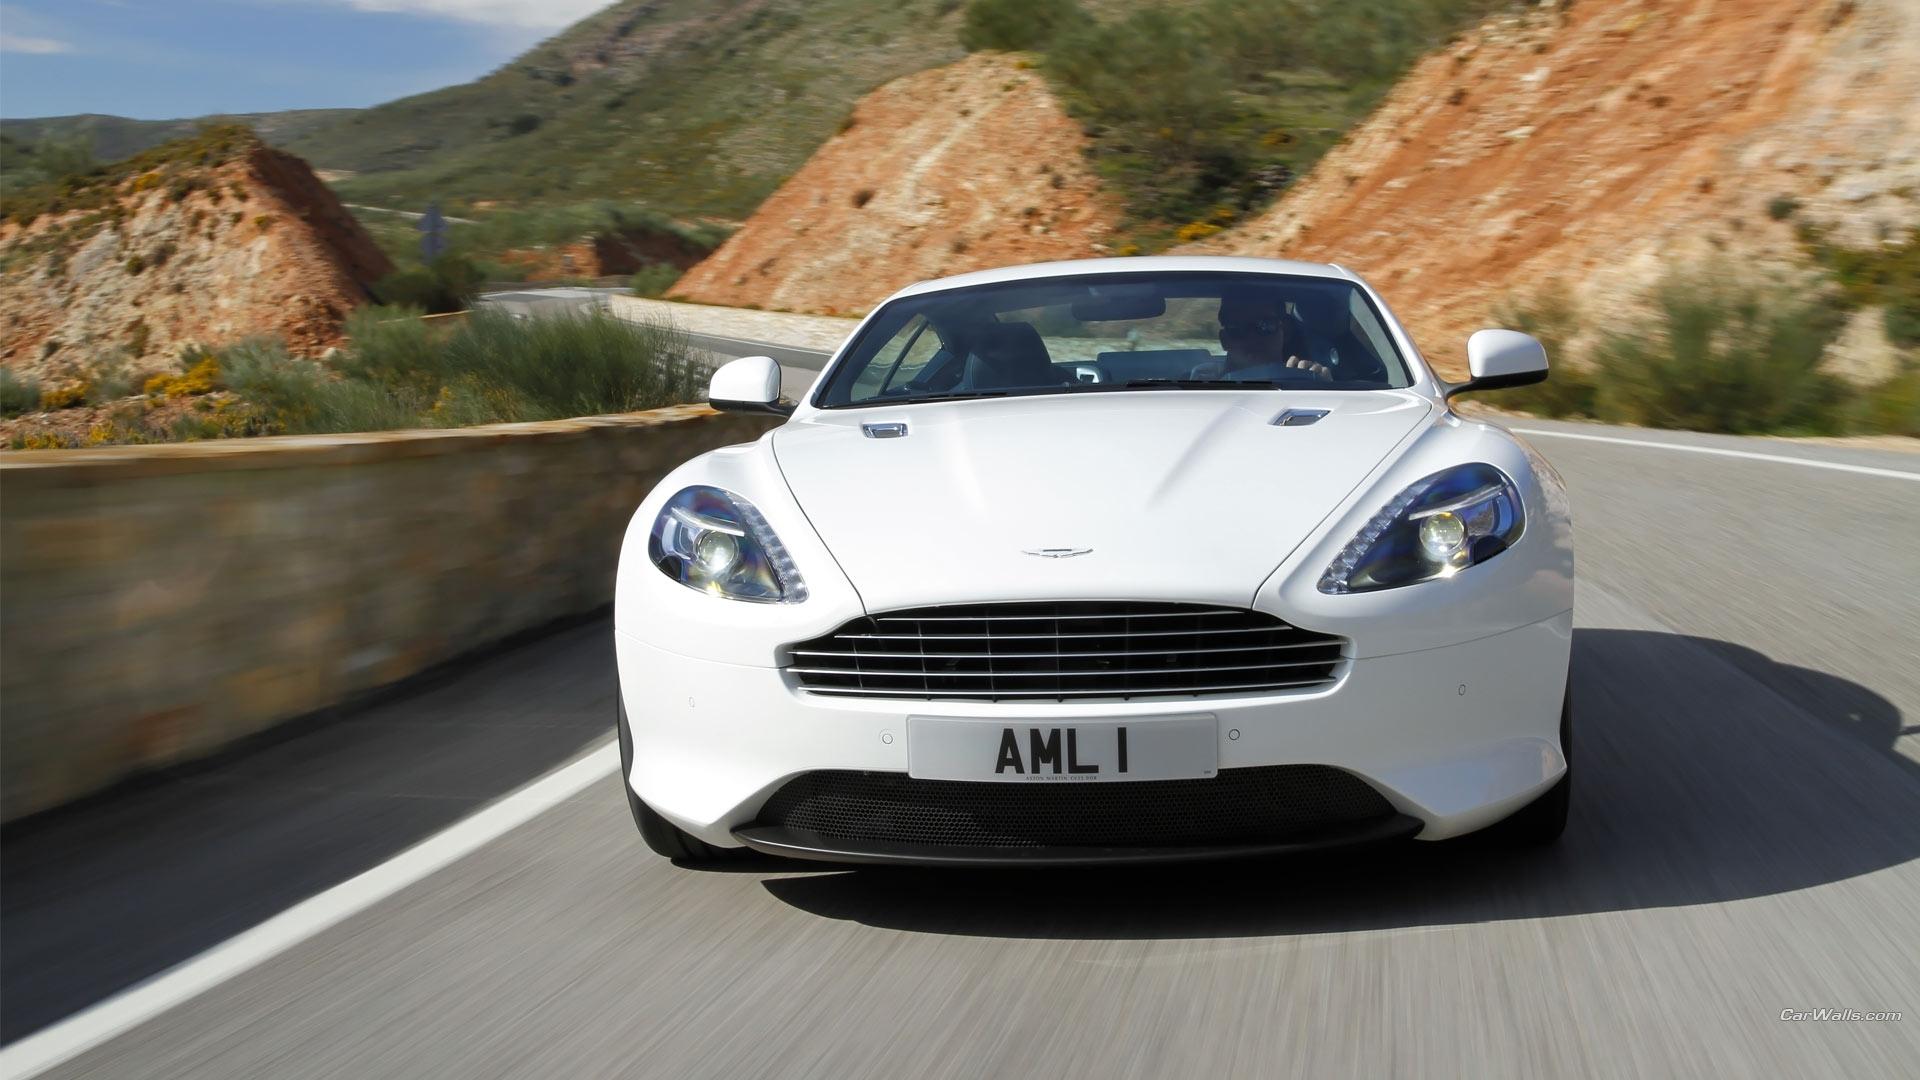 41441 скачать обои Транспорт, Машины, Дороги, Астон Мартин (Aston Martin) - заставки и картинки бесплатно